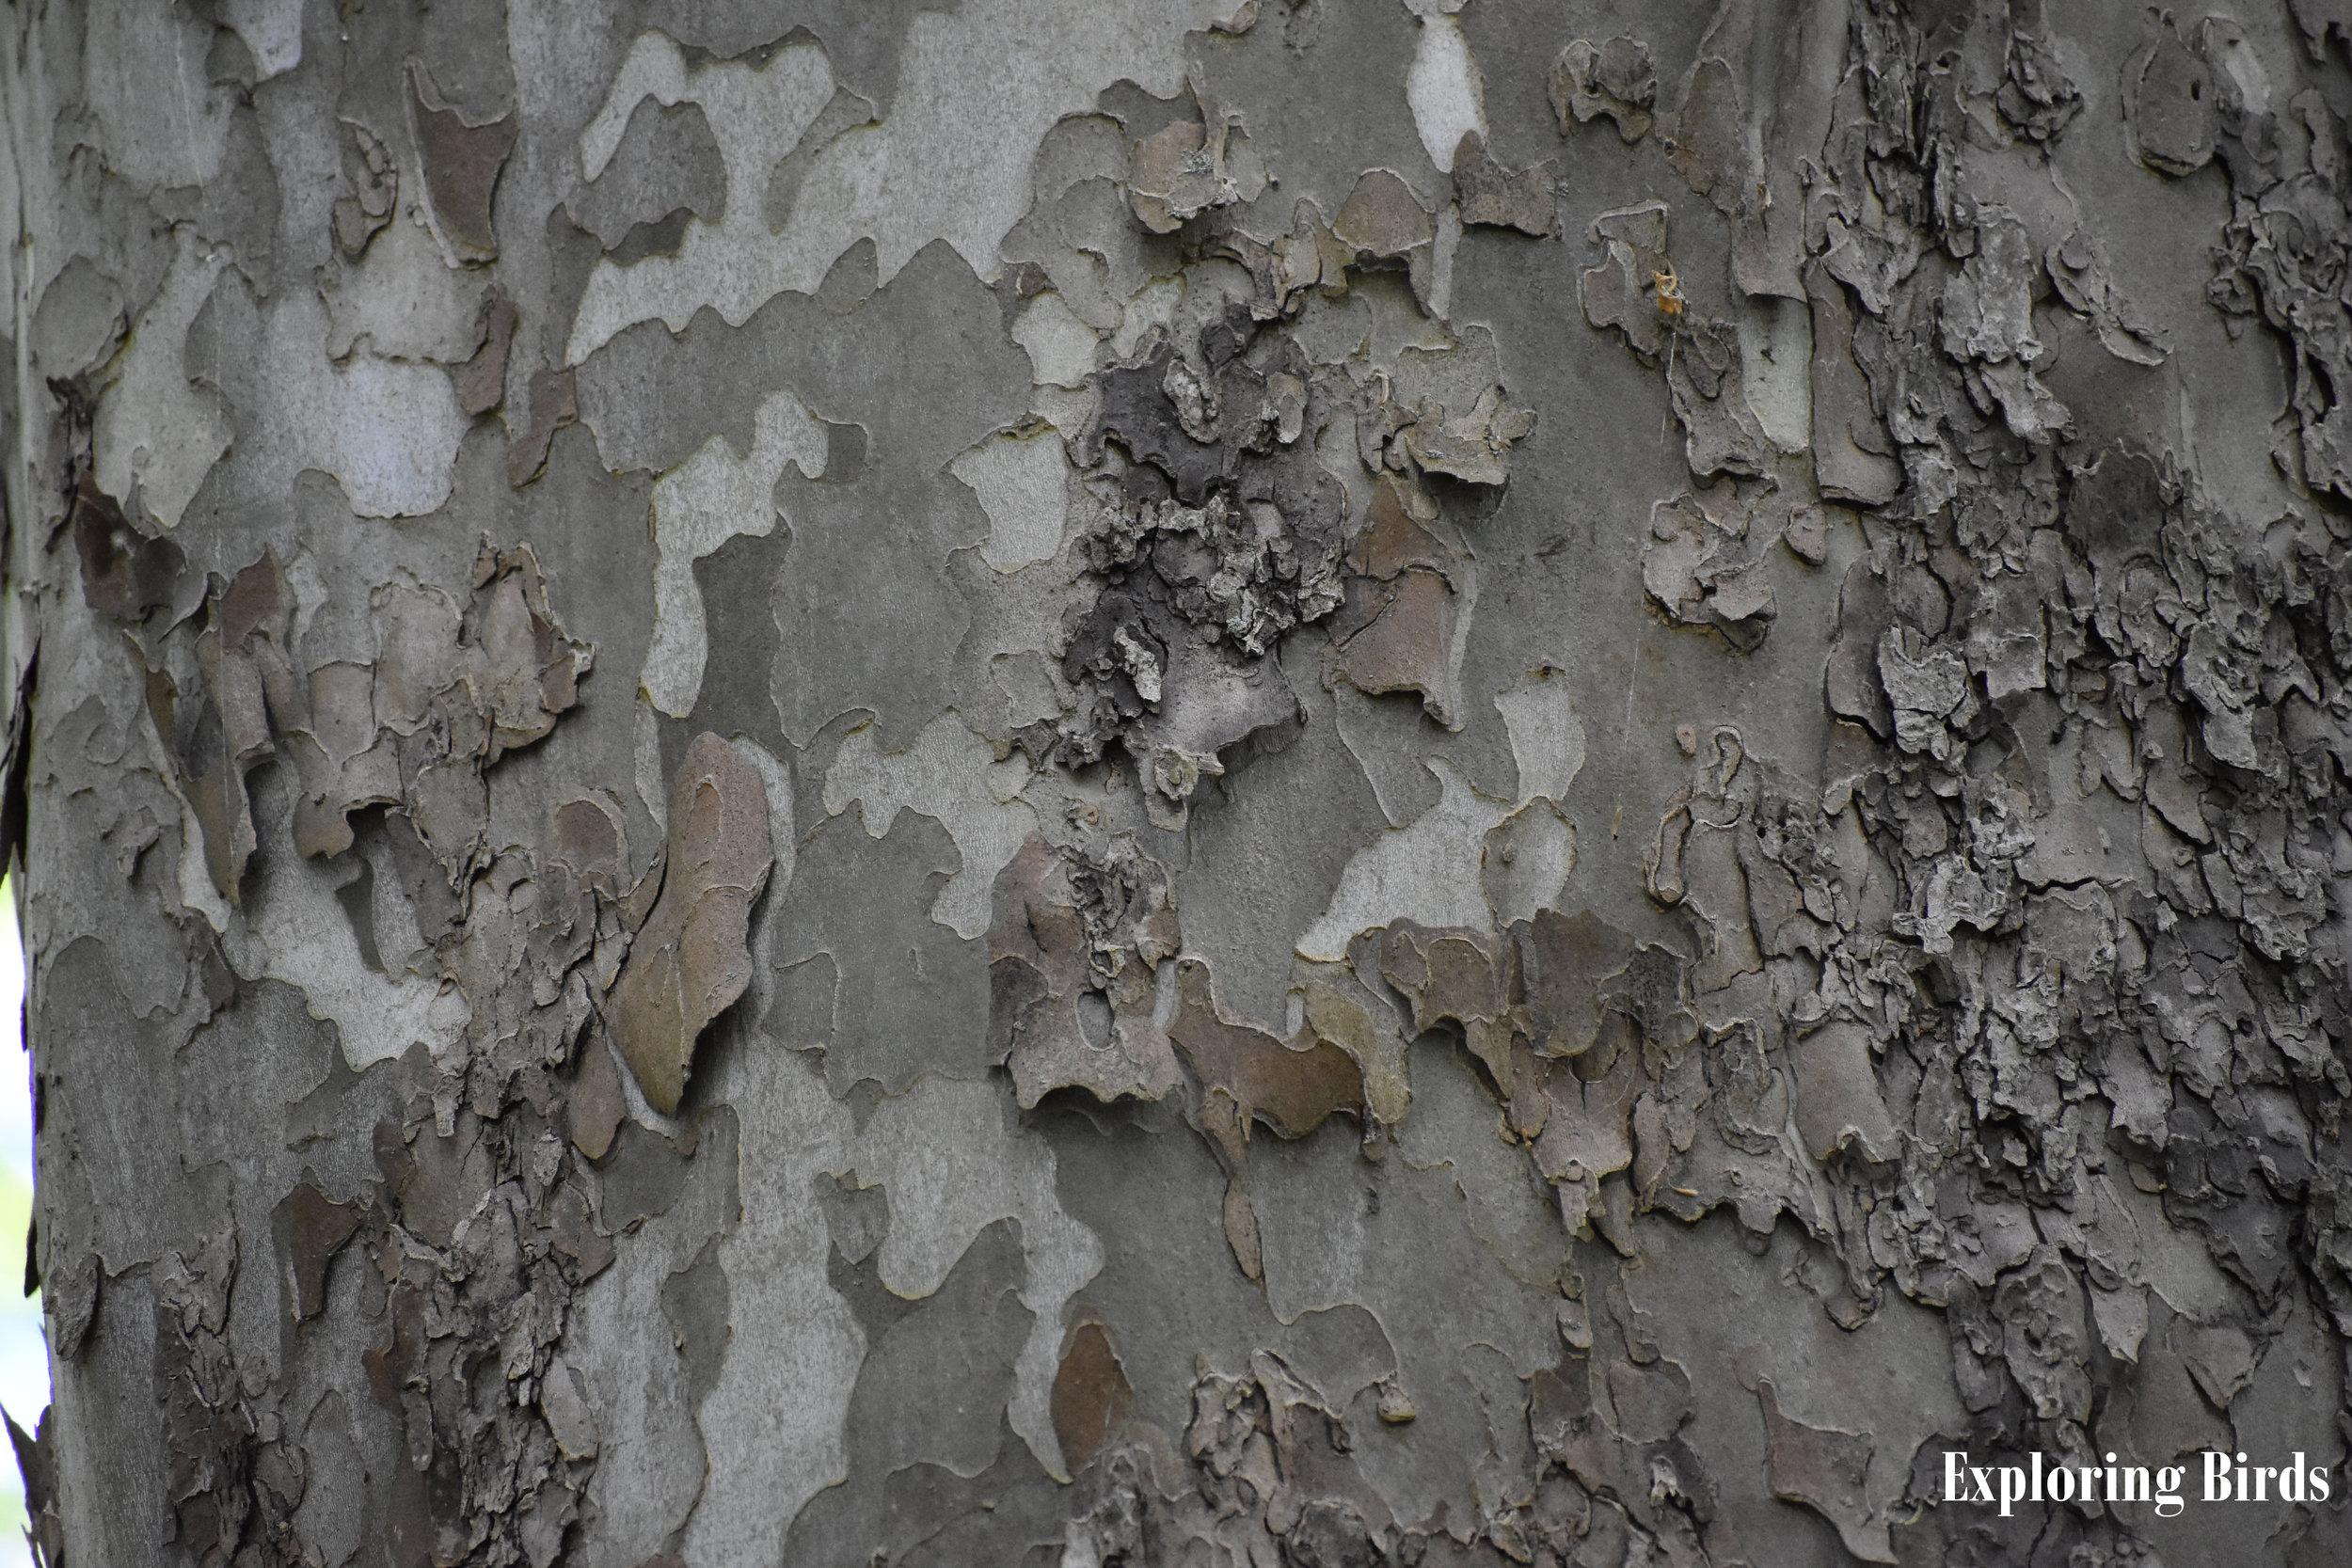 American Sycamore bark identification